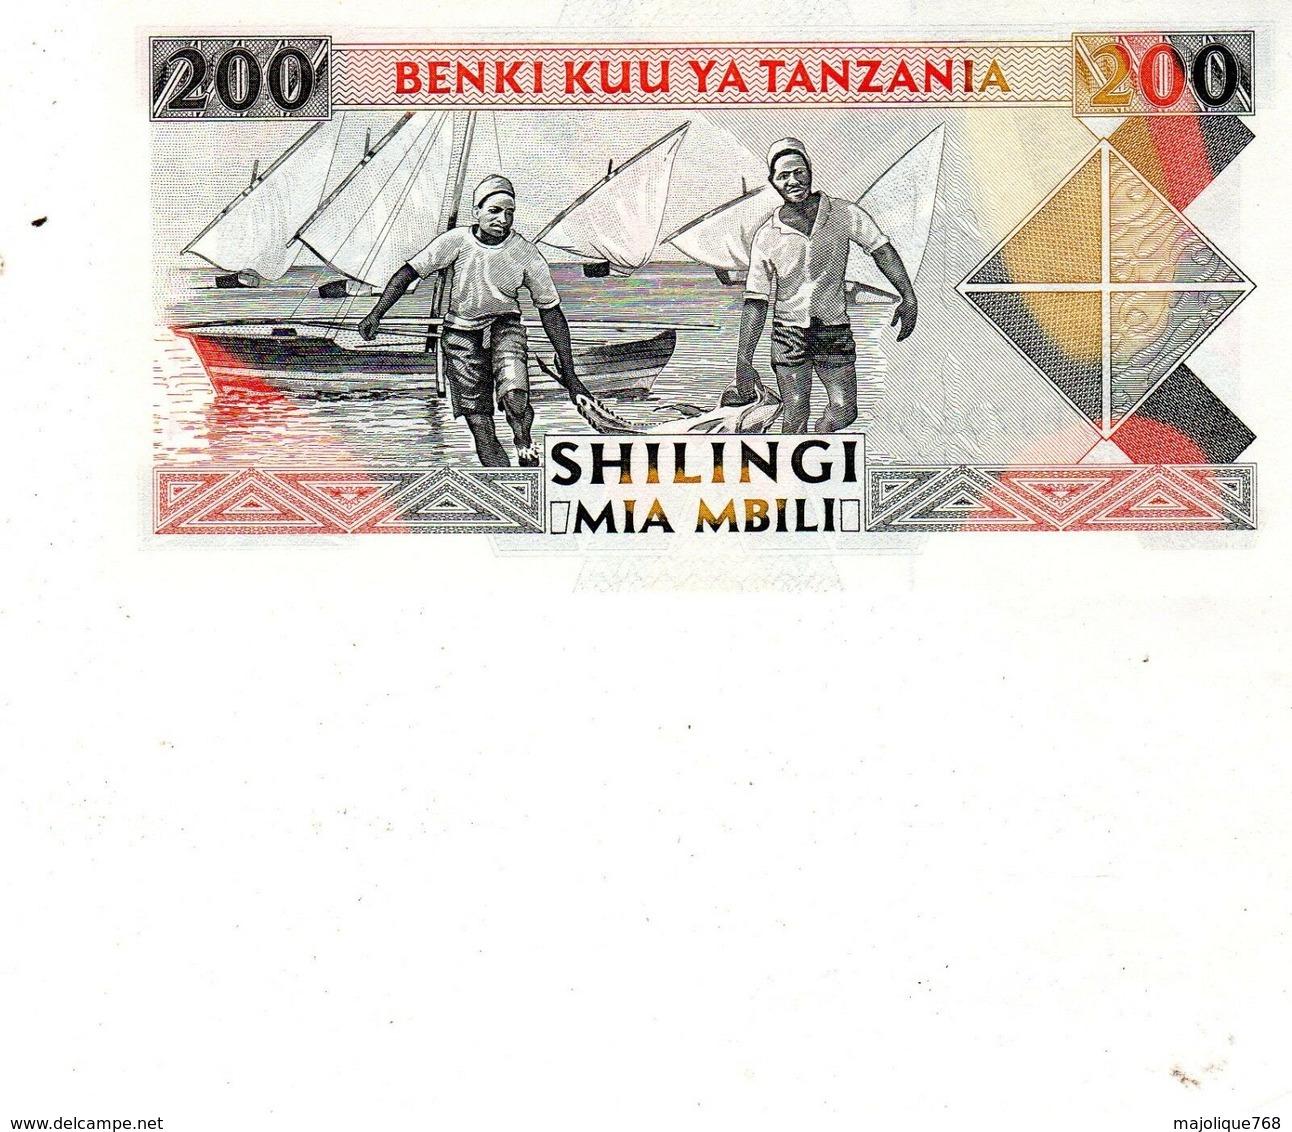 Billet De Banque De La Tanzanie De 200 Shilingi, 1993 Non Daté Neuf - - Tanzania